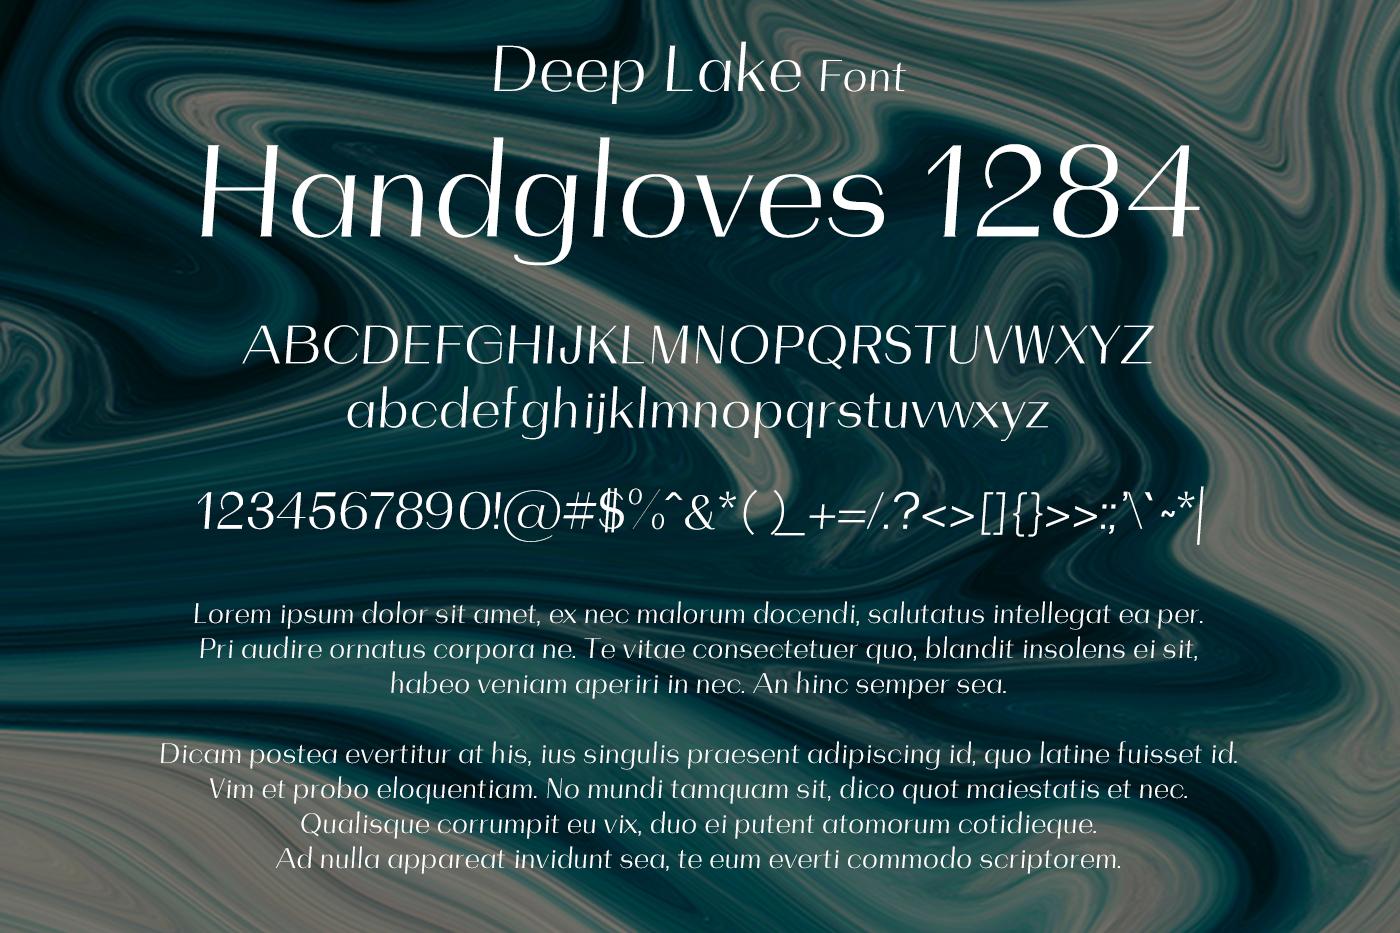 Deep Lake Font example image 2